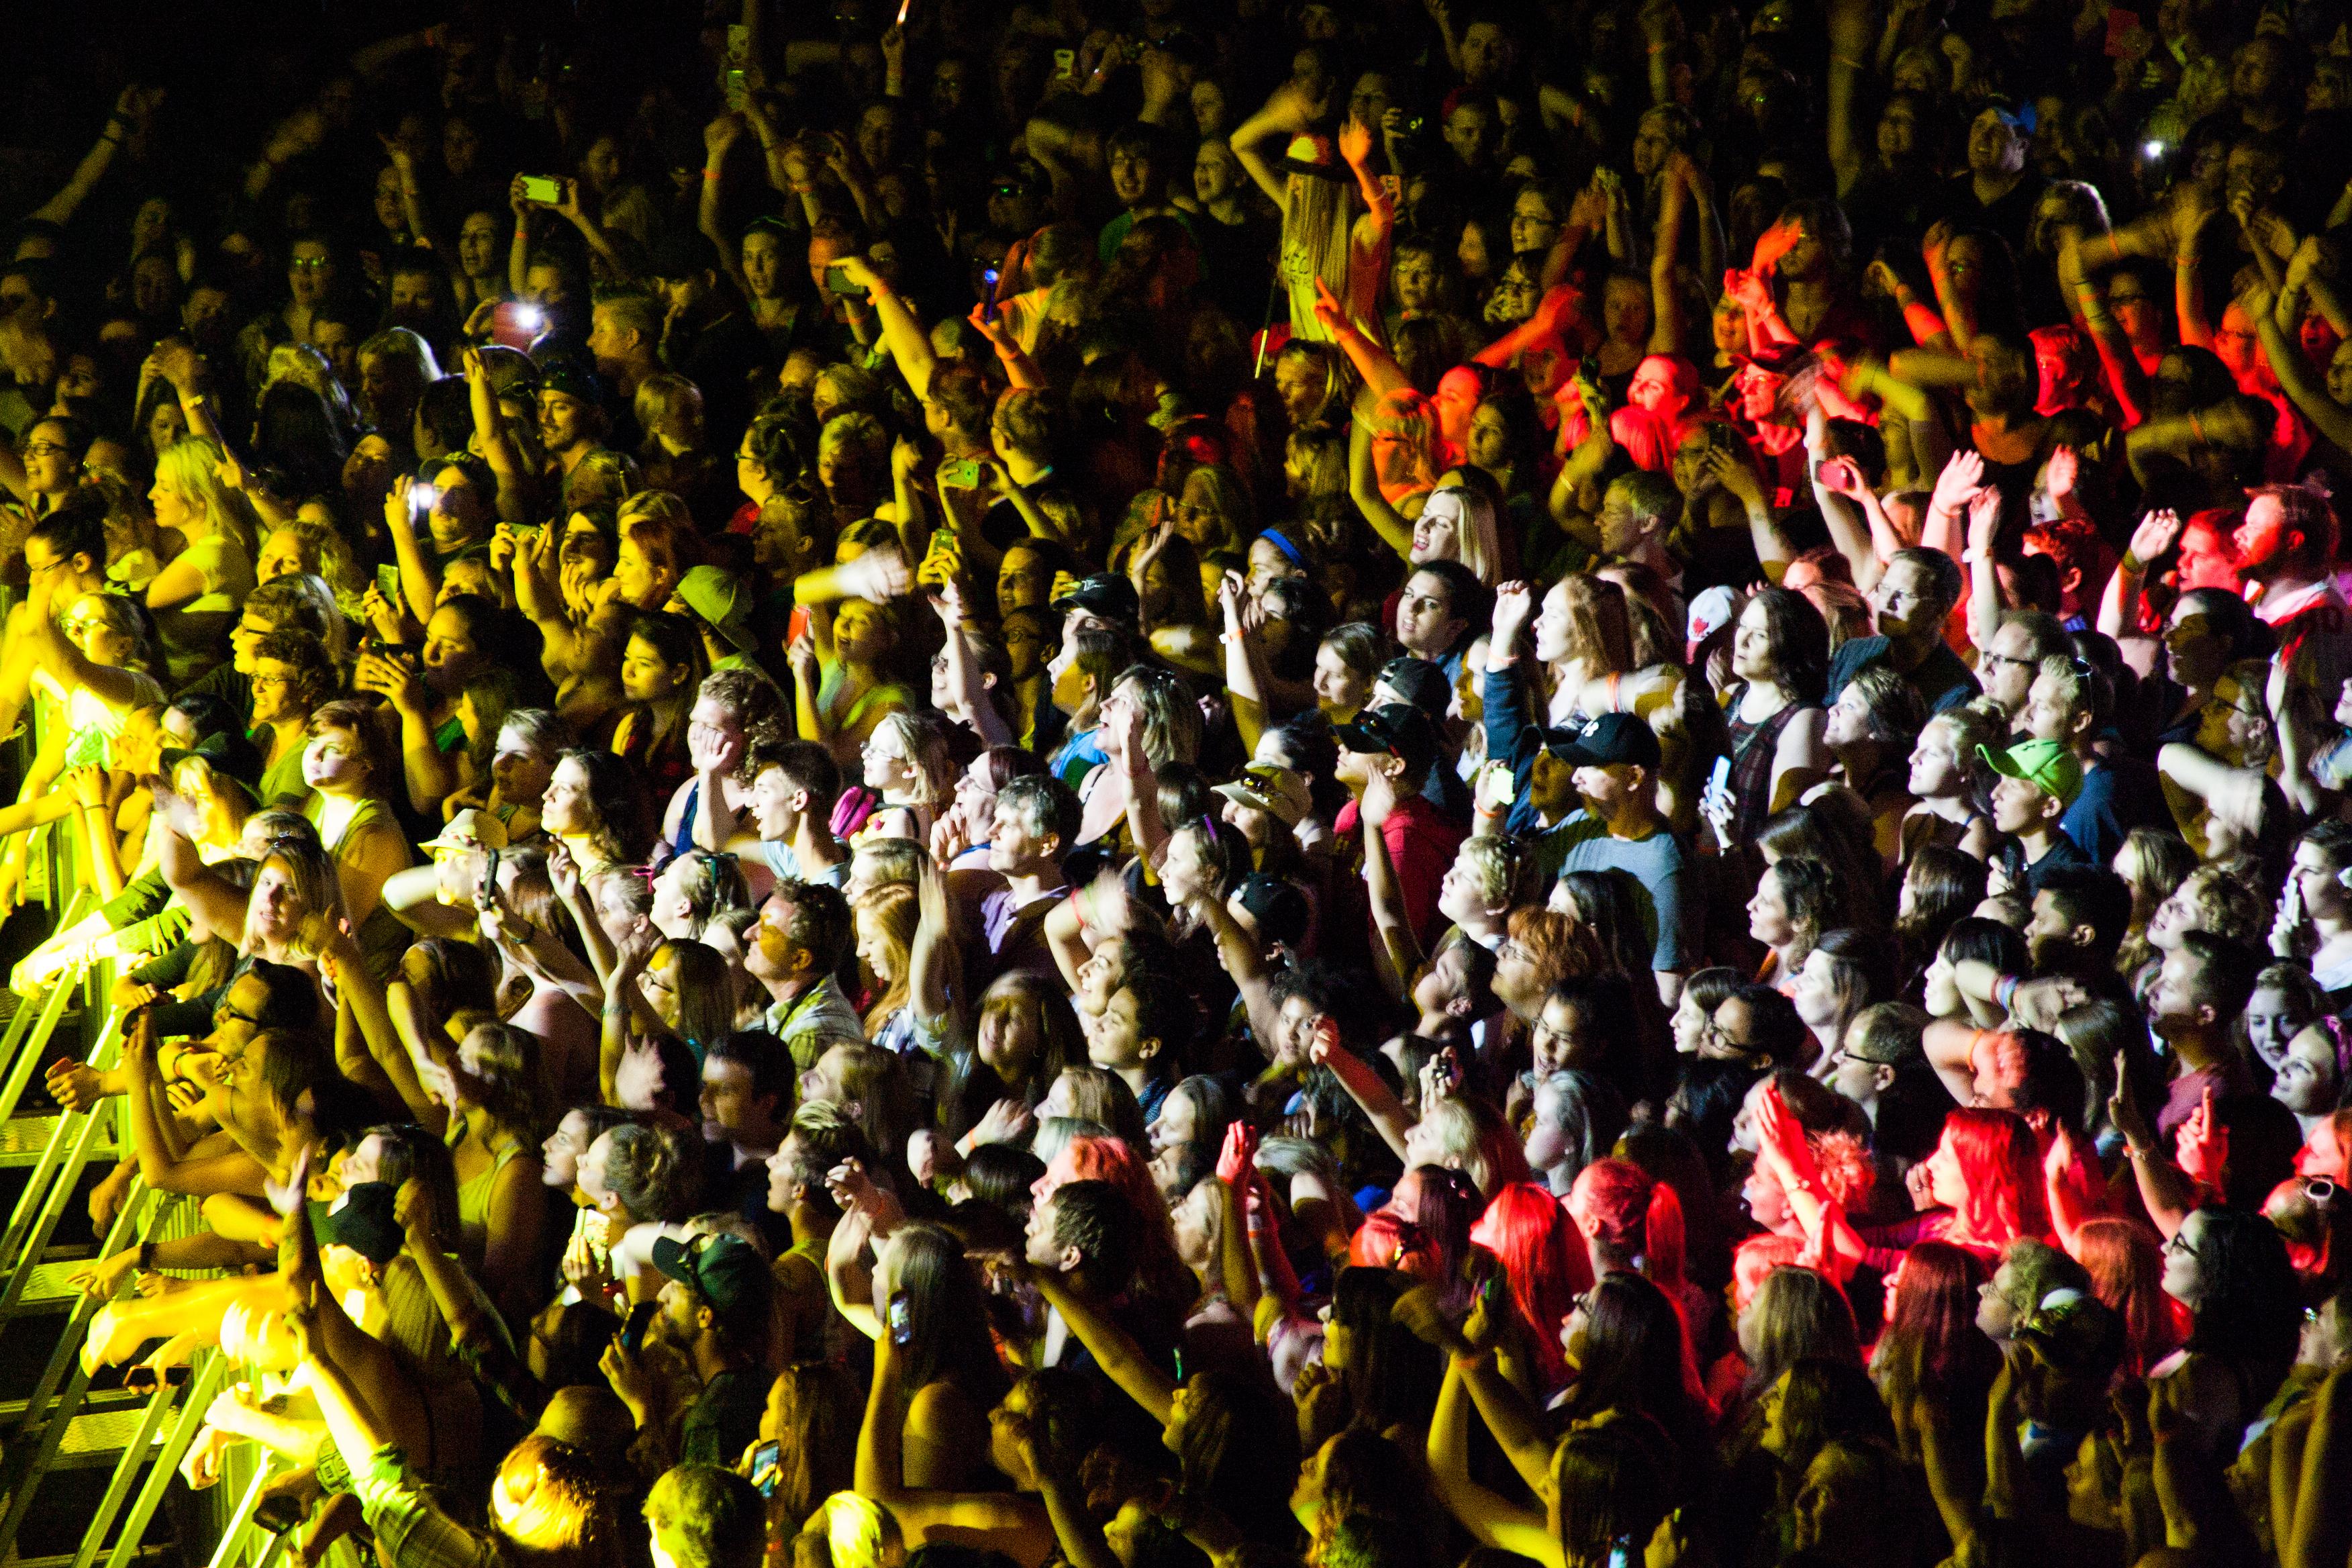 Empire Rockfest crowd at Hedley, 2015. Photo Brock Cruess.